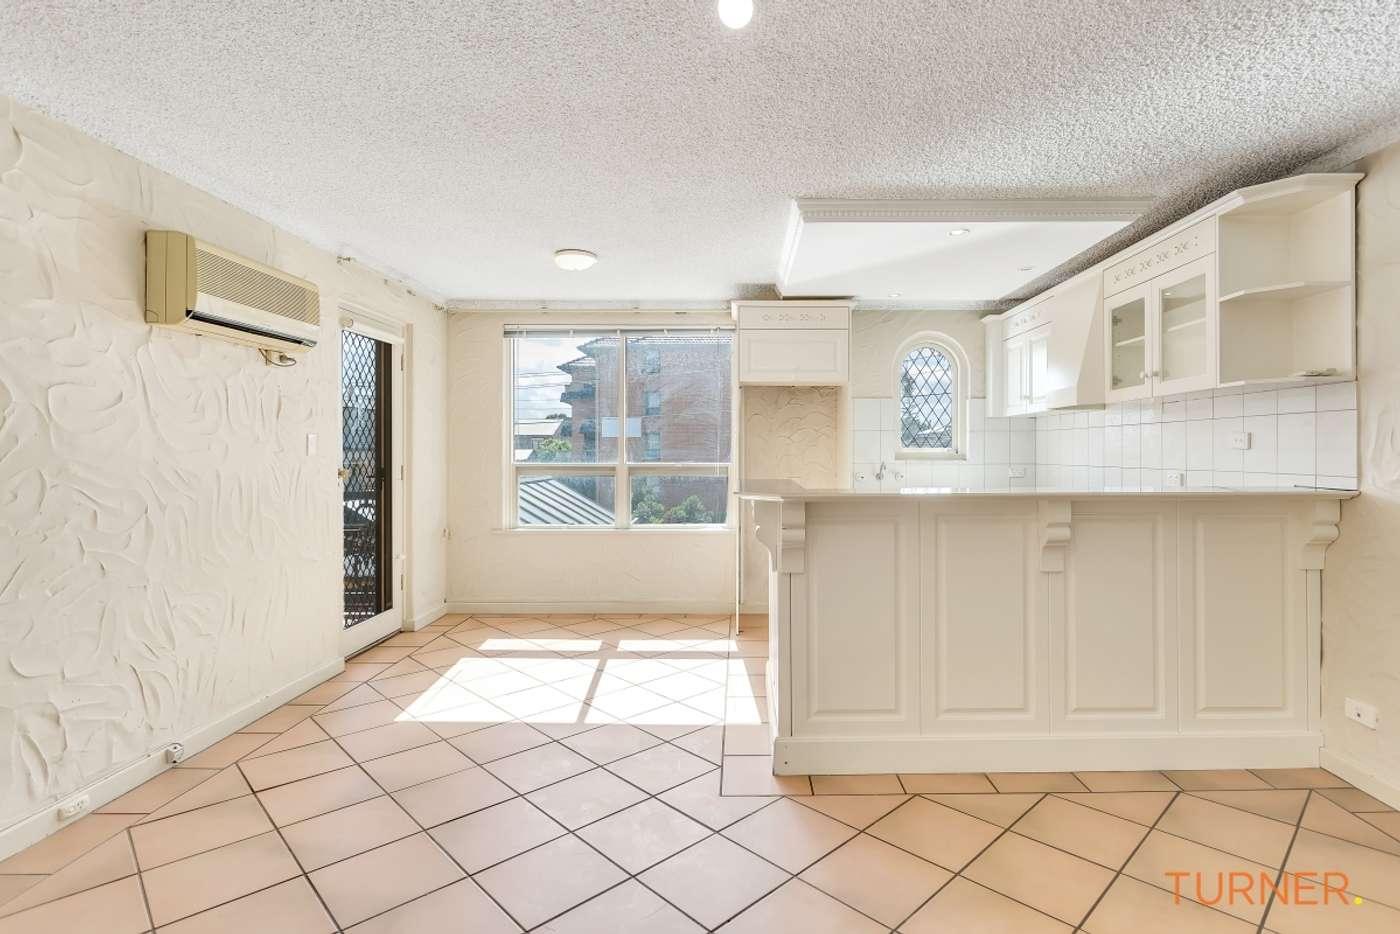 Main view of Homely unit listing, 5/35 Nile Street, Glenelg SA 5045